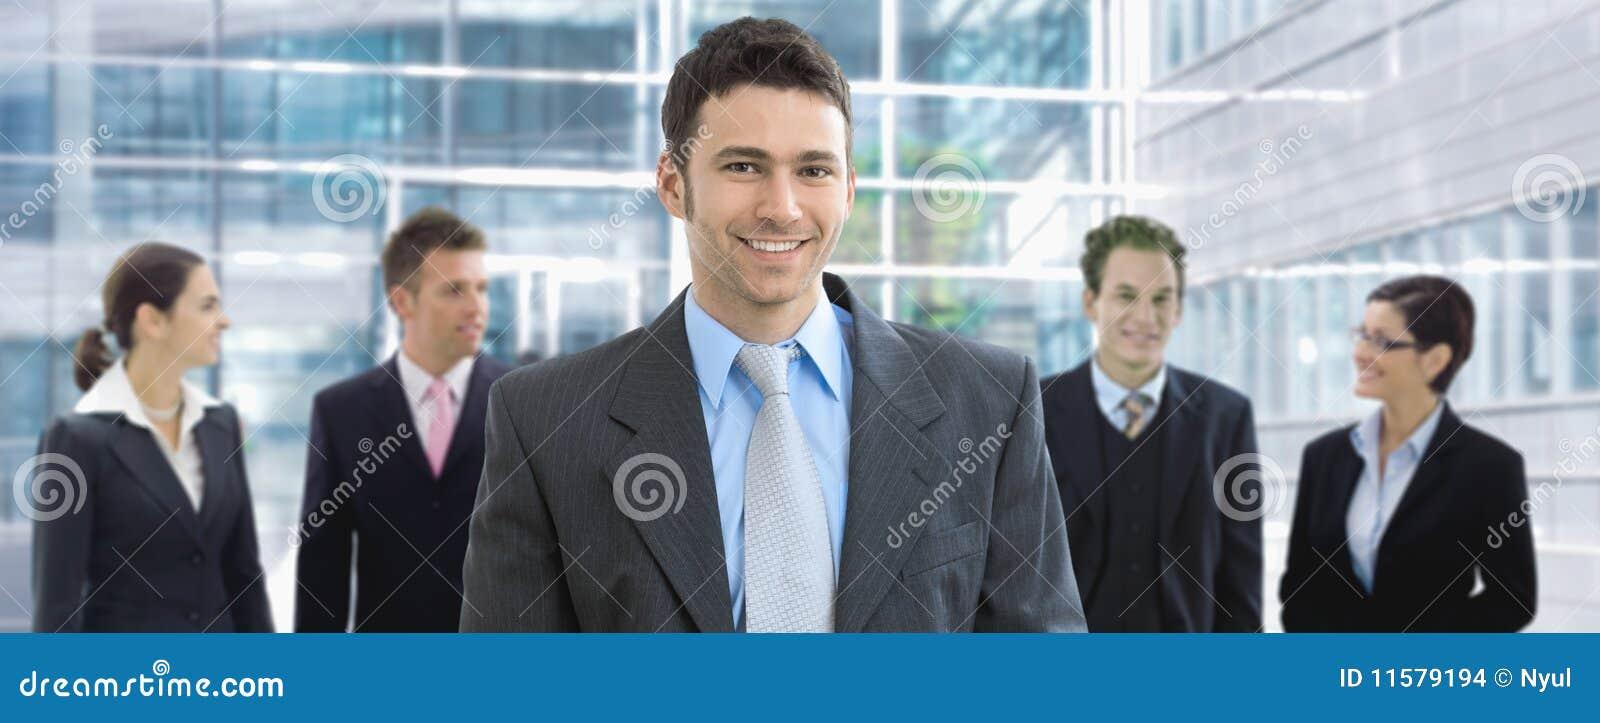 Businessman and team